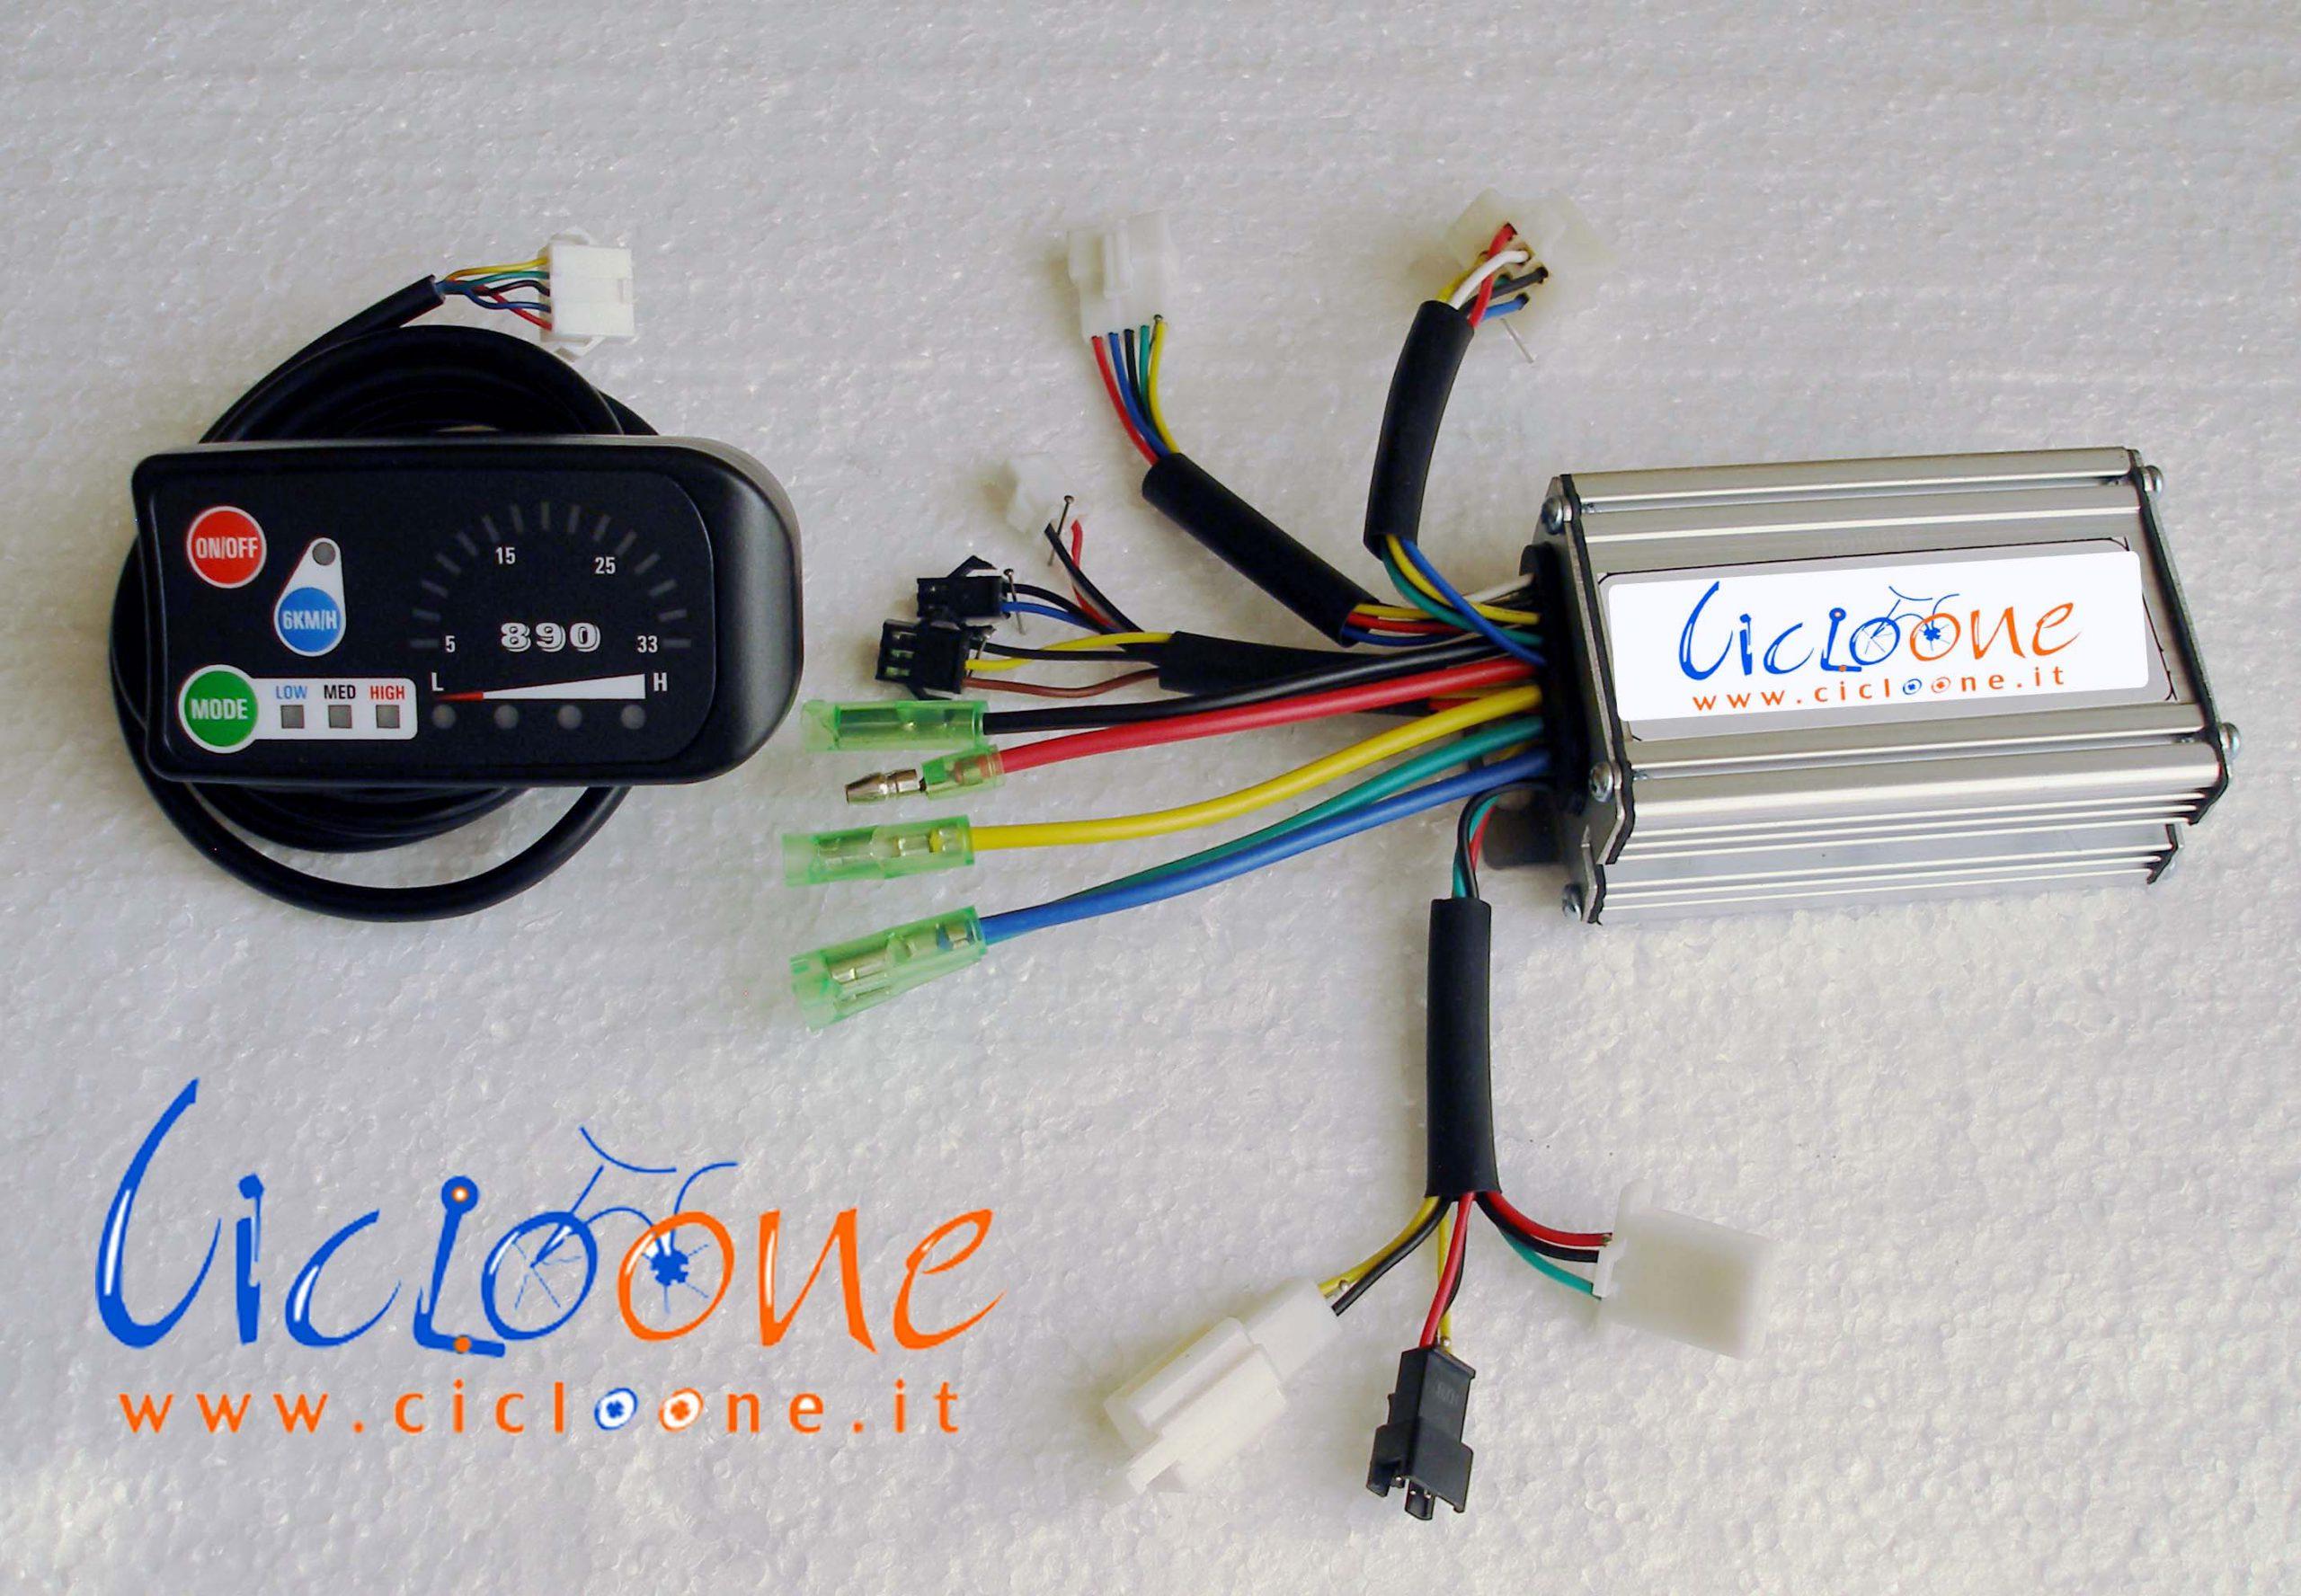 centralina sensore torque 250watt con display led 890